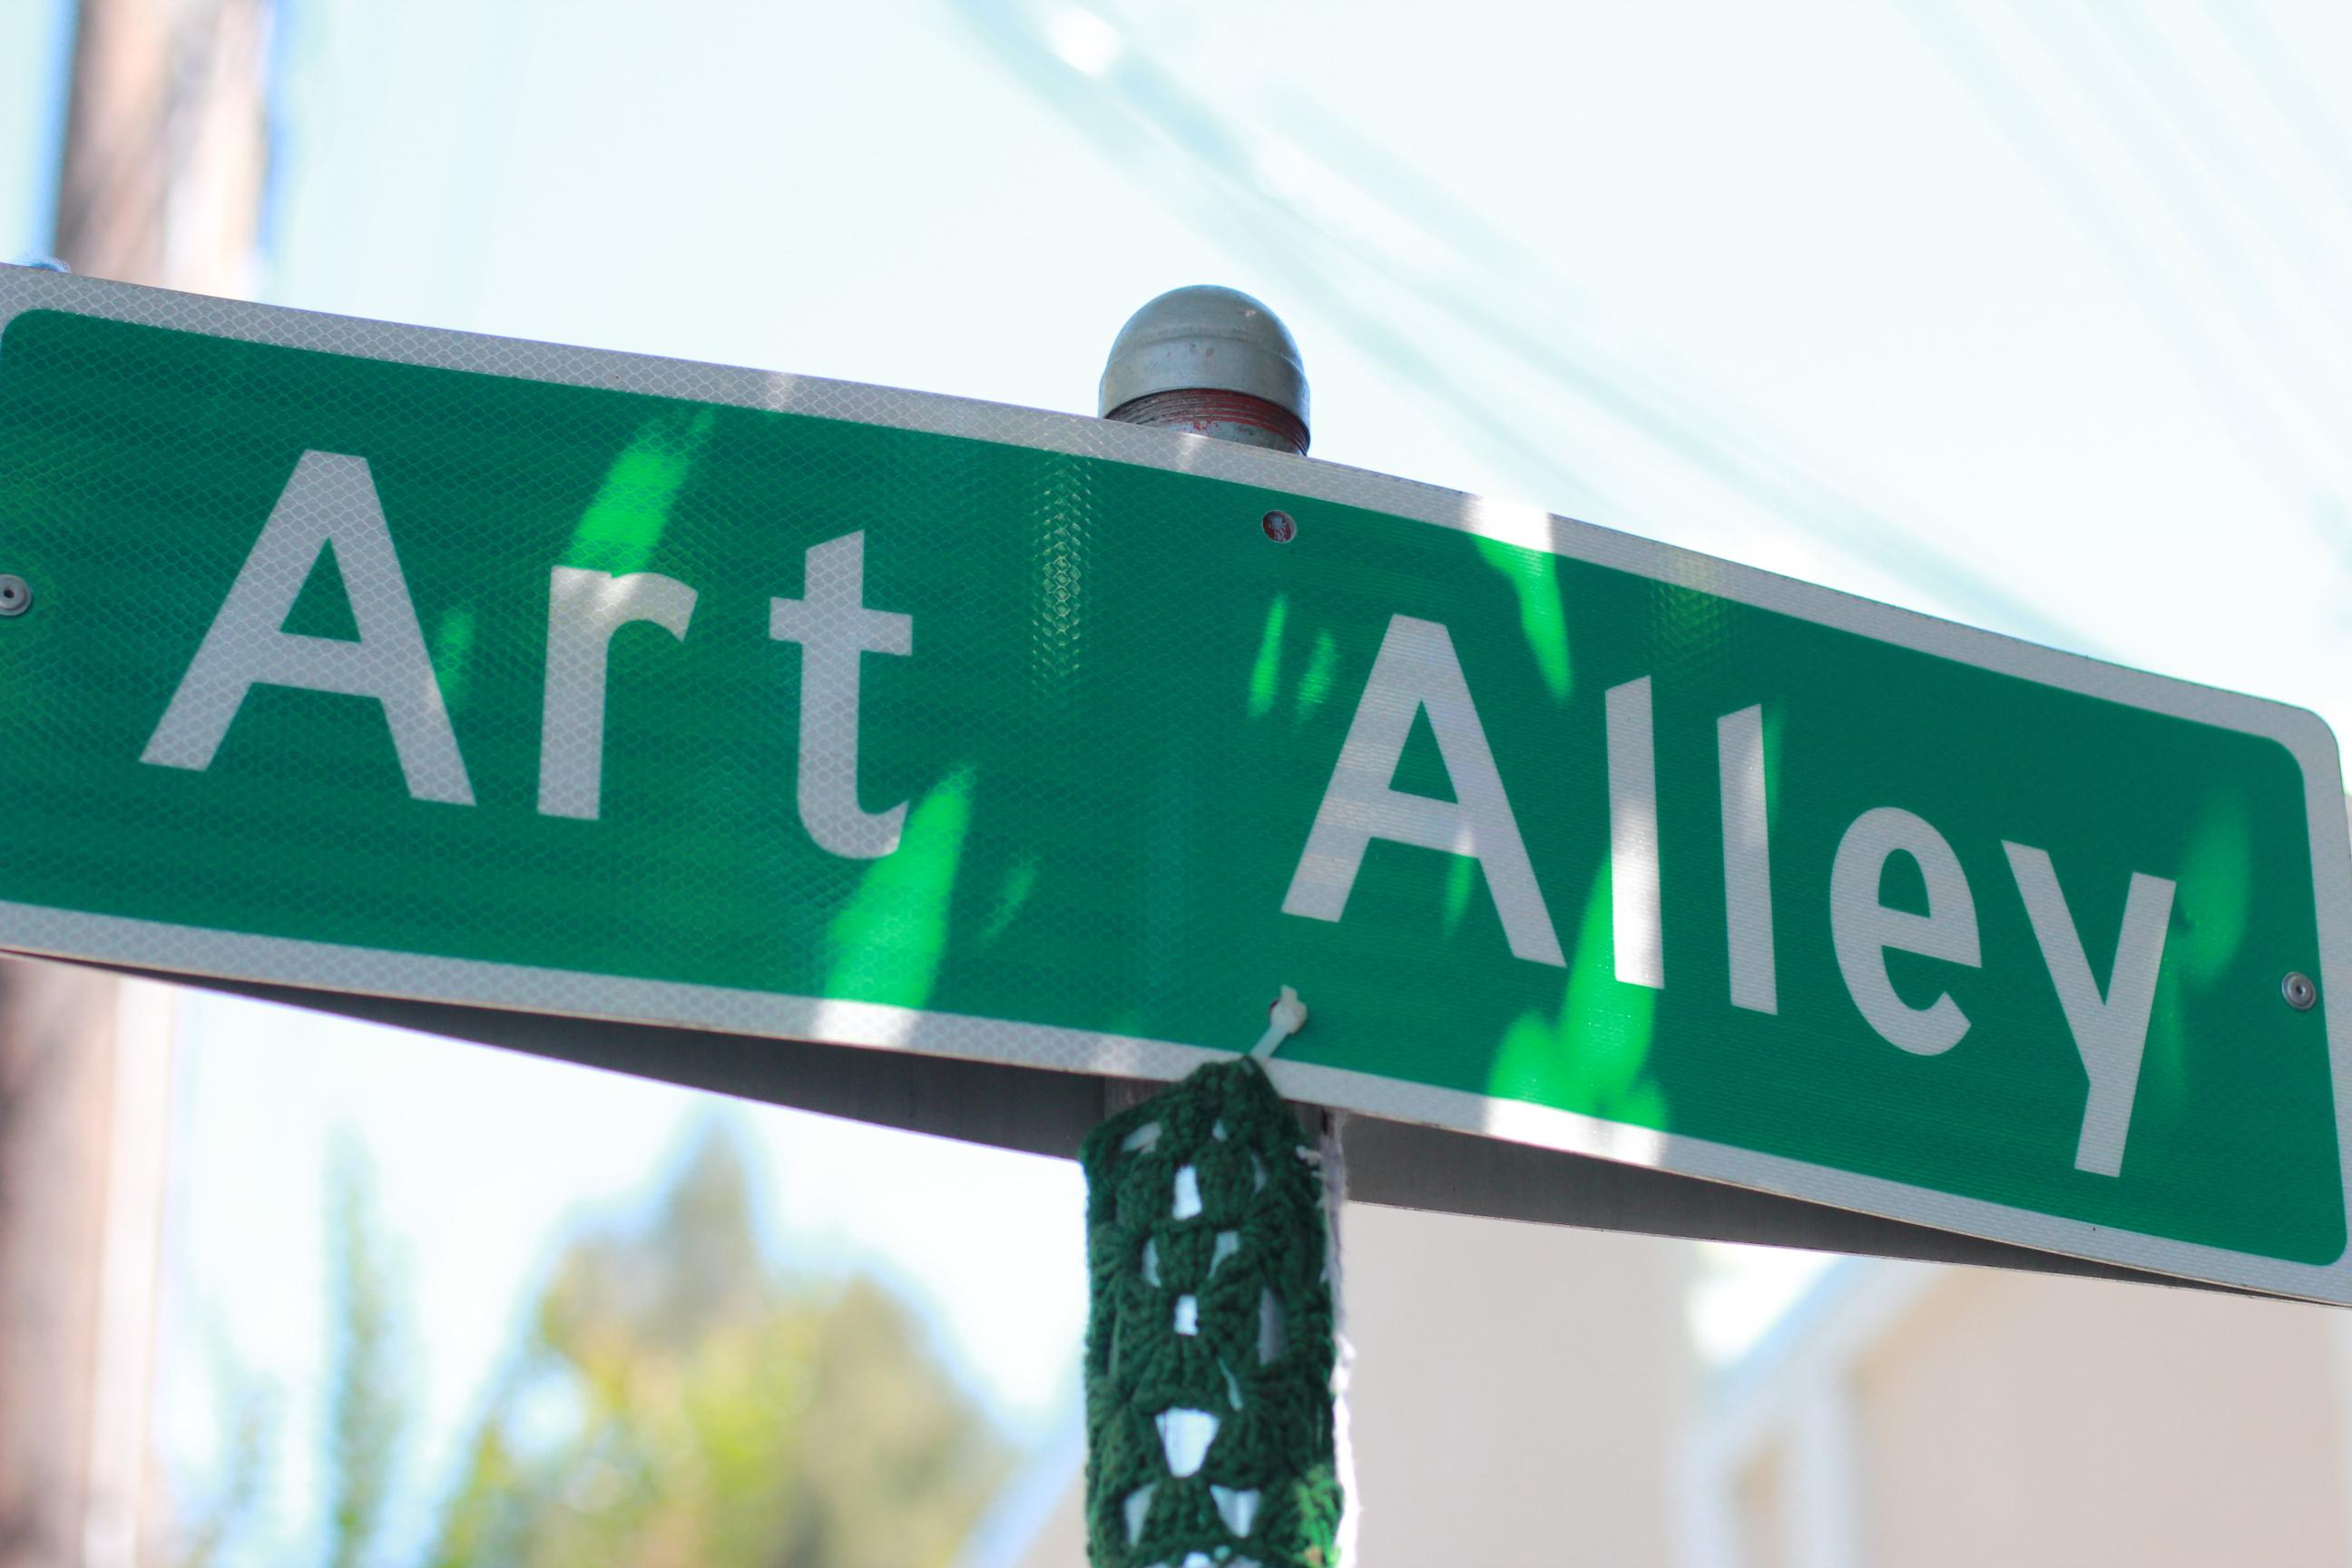 SOFA Art Alley